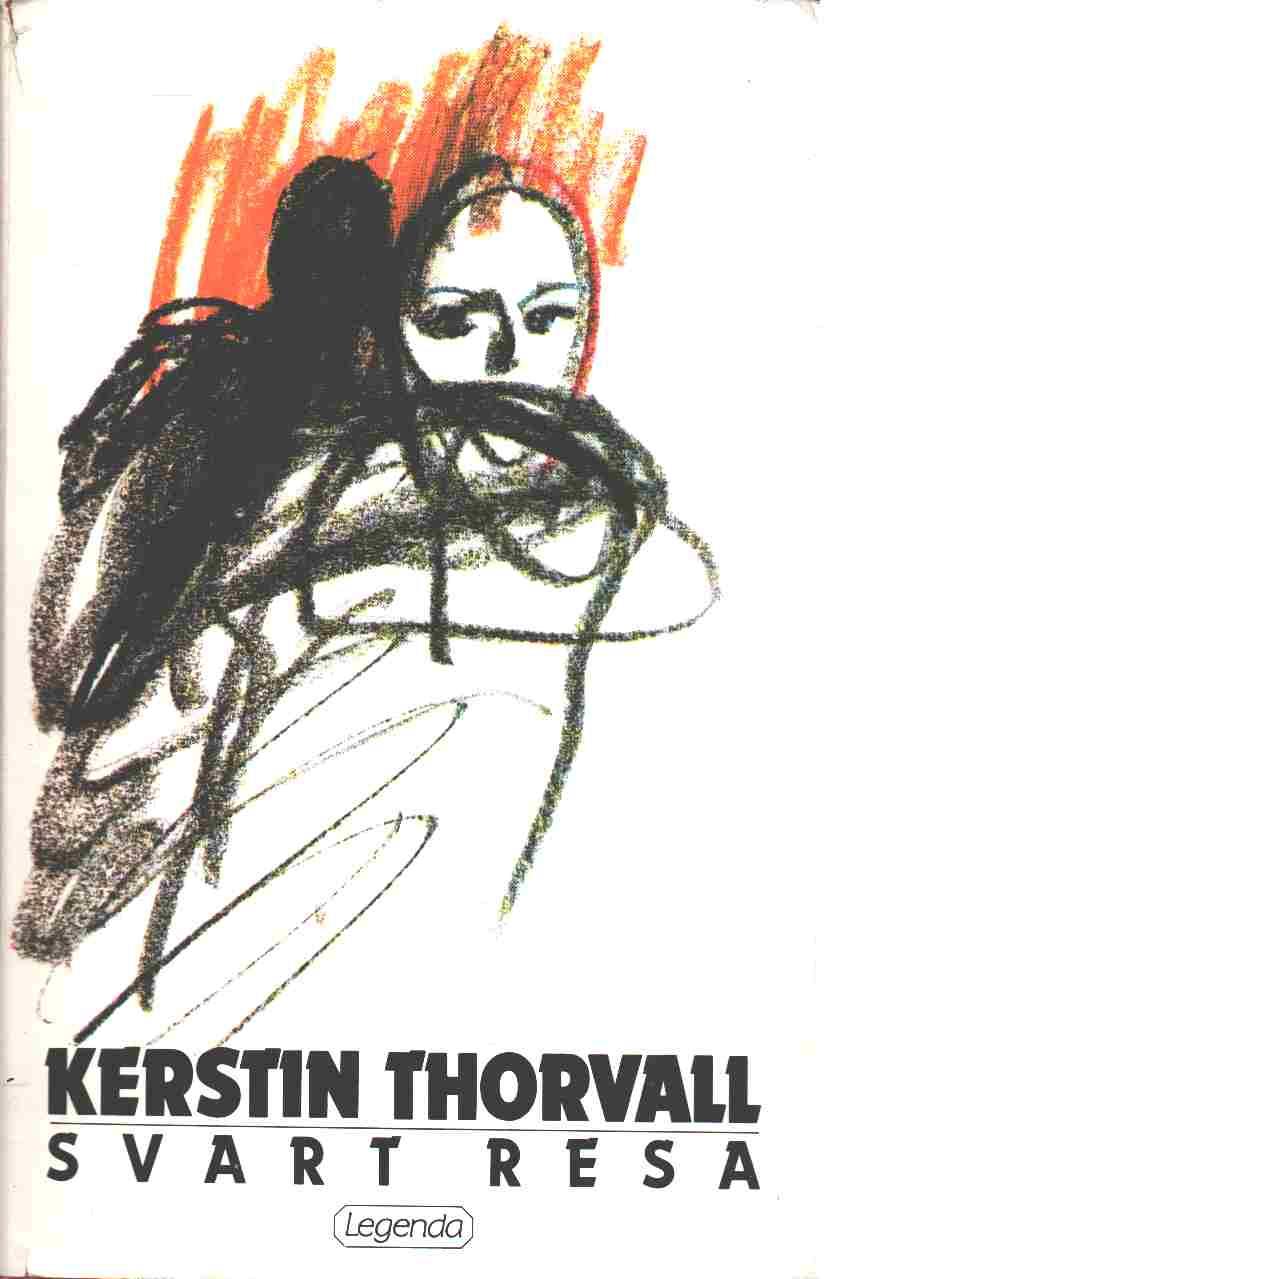 Svart resa - Thorvall, Kerstin